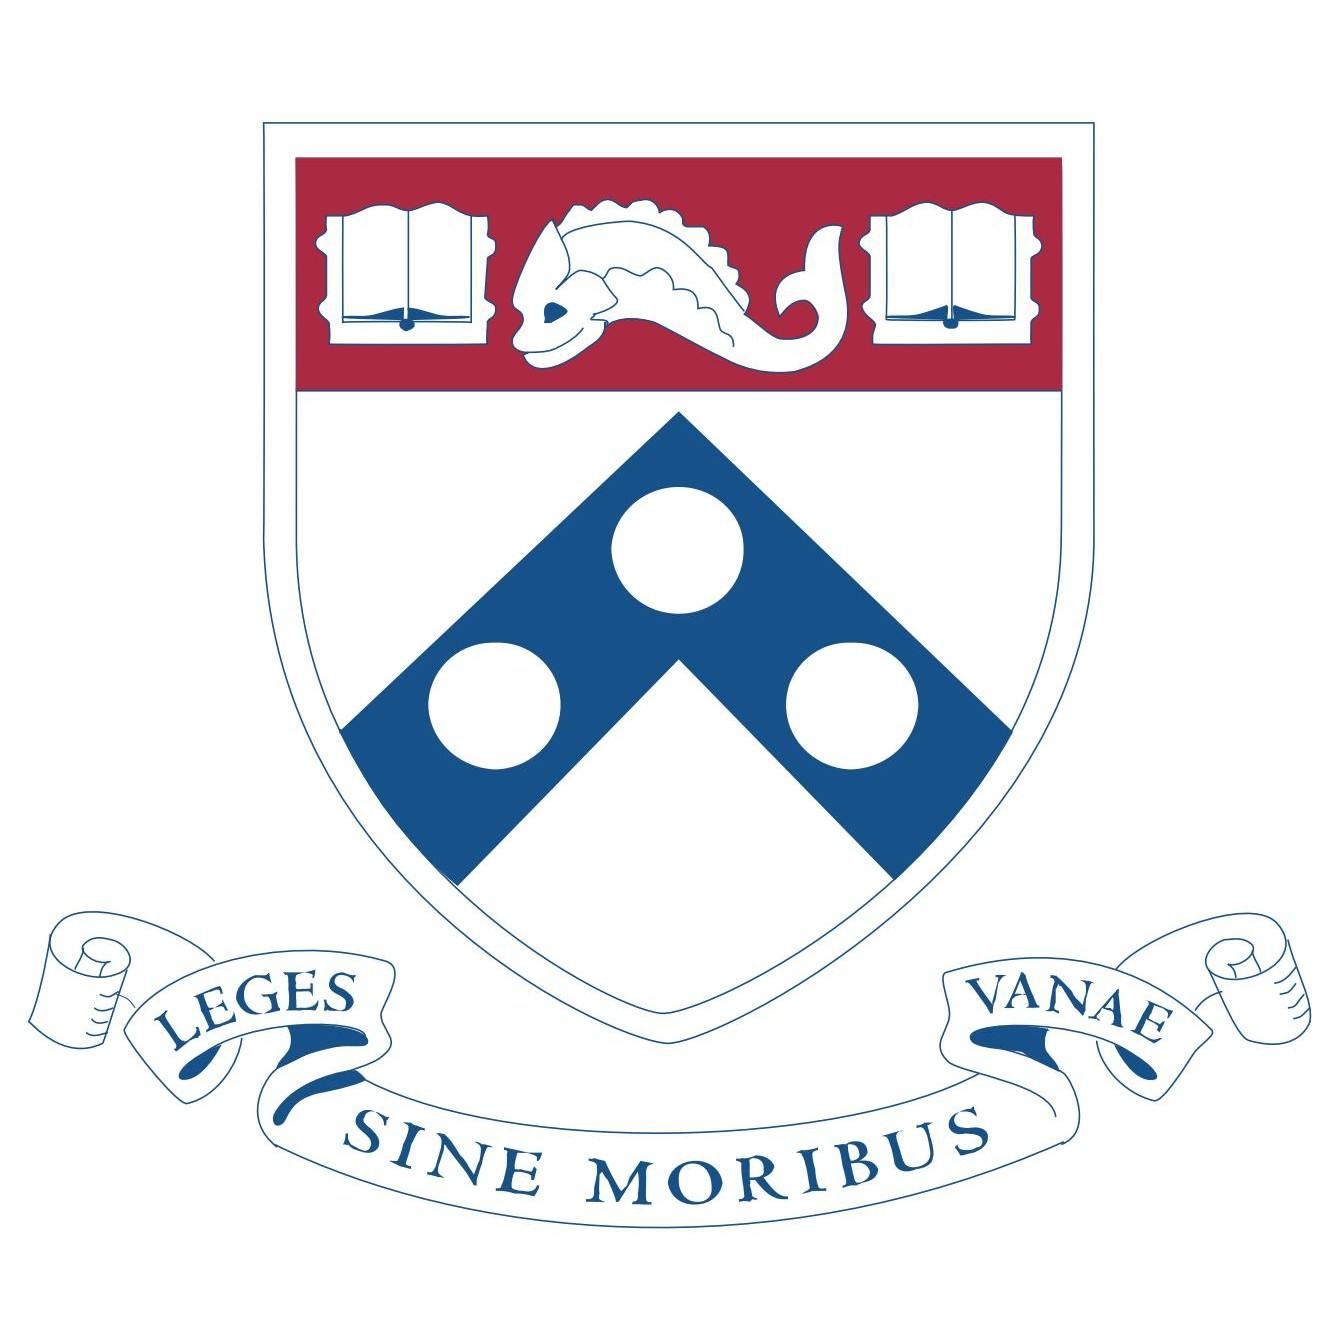 Penn_Logo_University_of_Pennsylvania - Coat of Arms